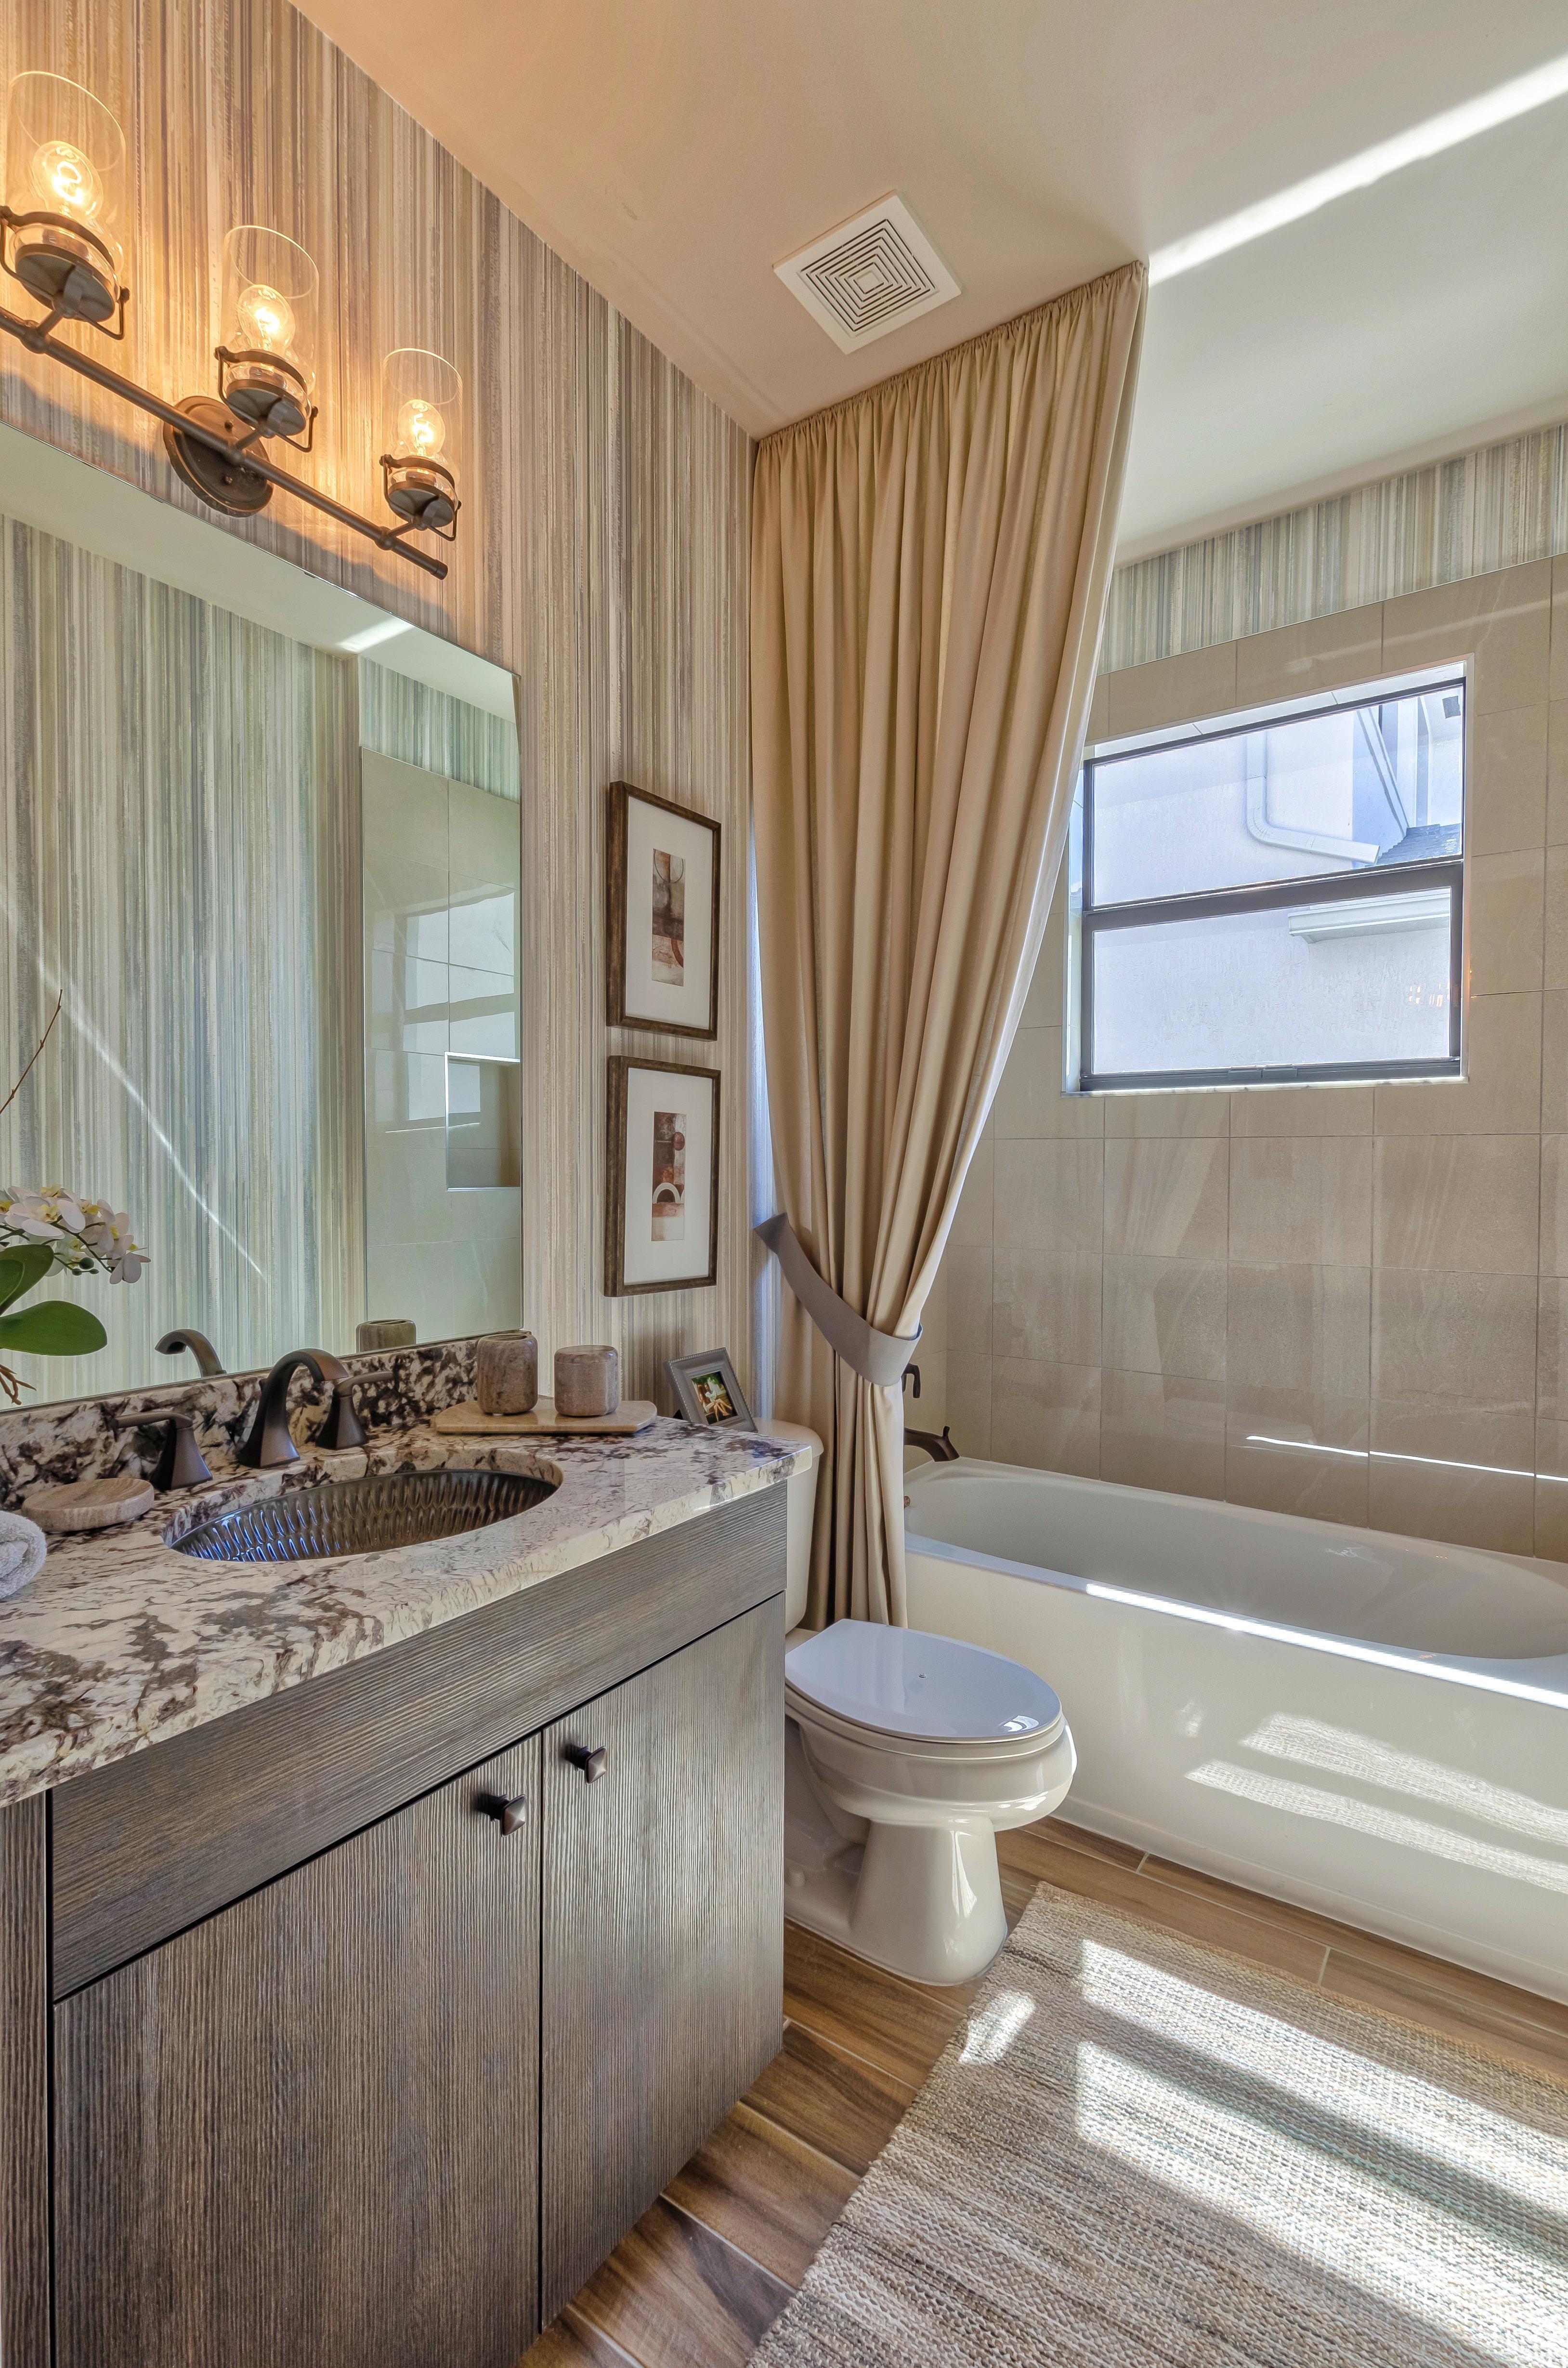 Bathroom featured in the Sierra By Akel Homes in Palm Beach County, FL